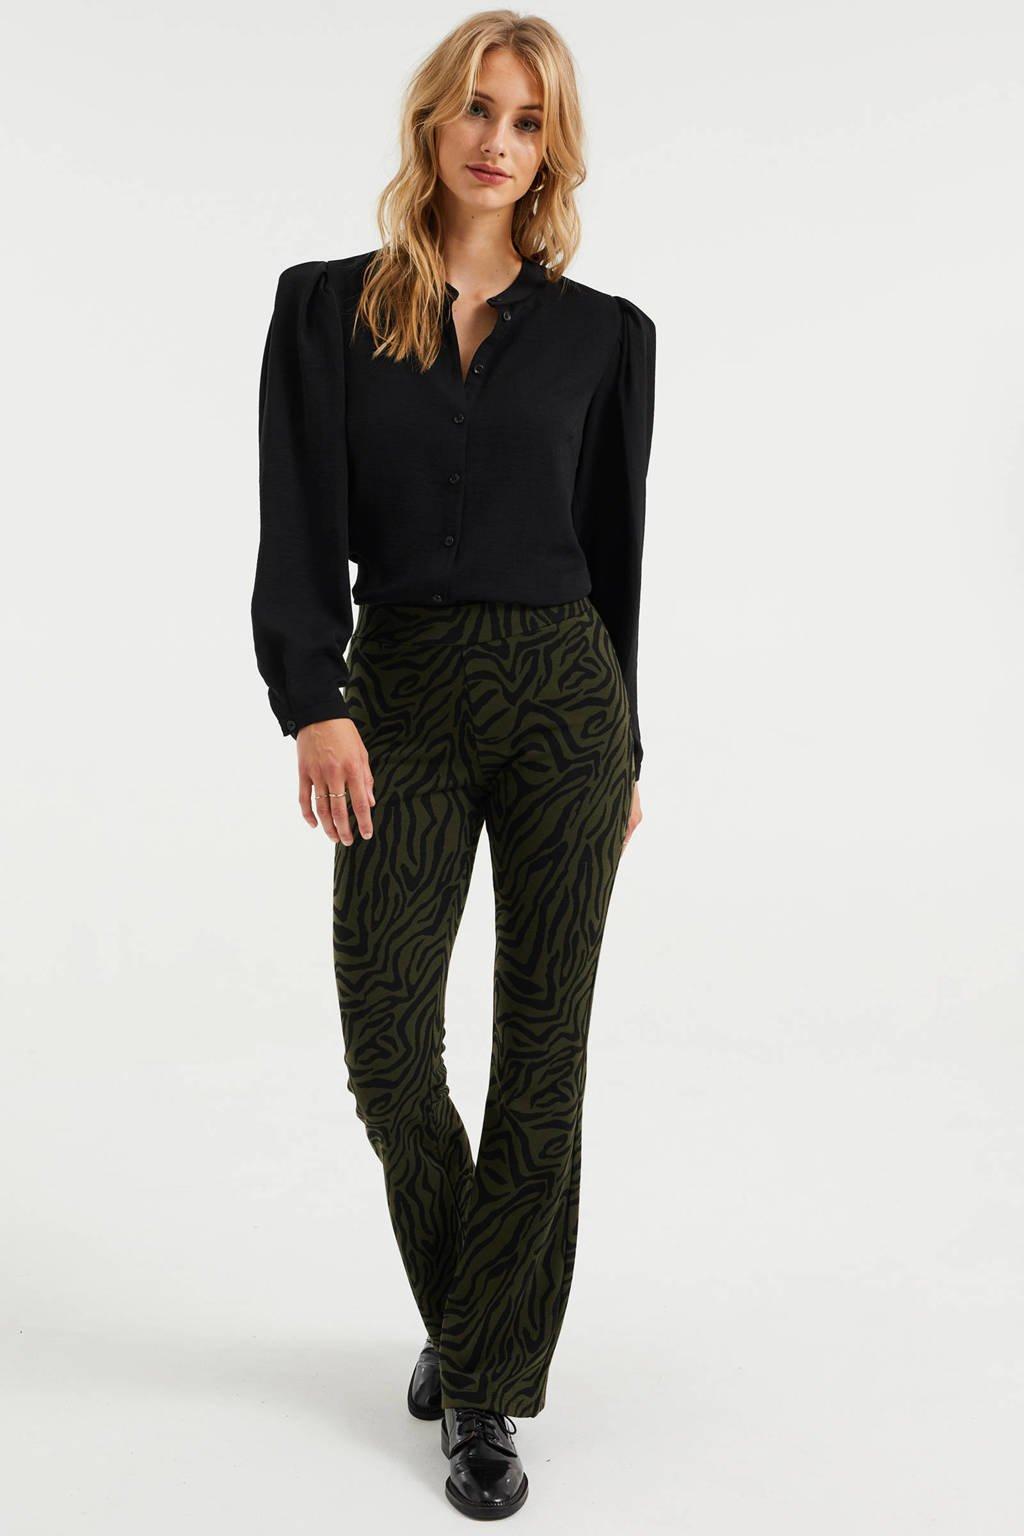 WE Fashion flared broek met zebraprint donkergroen/zwart, Donkergroen/zwart